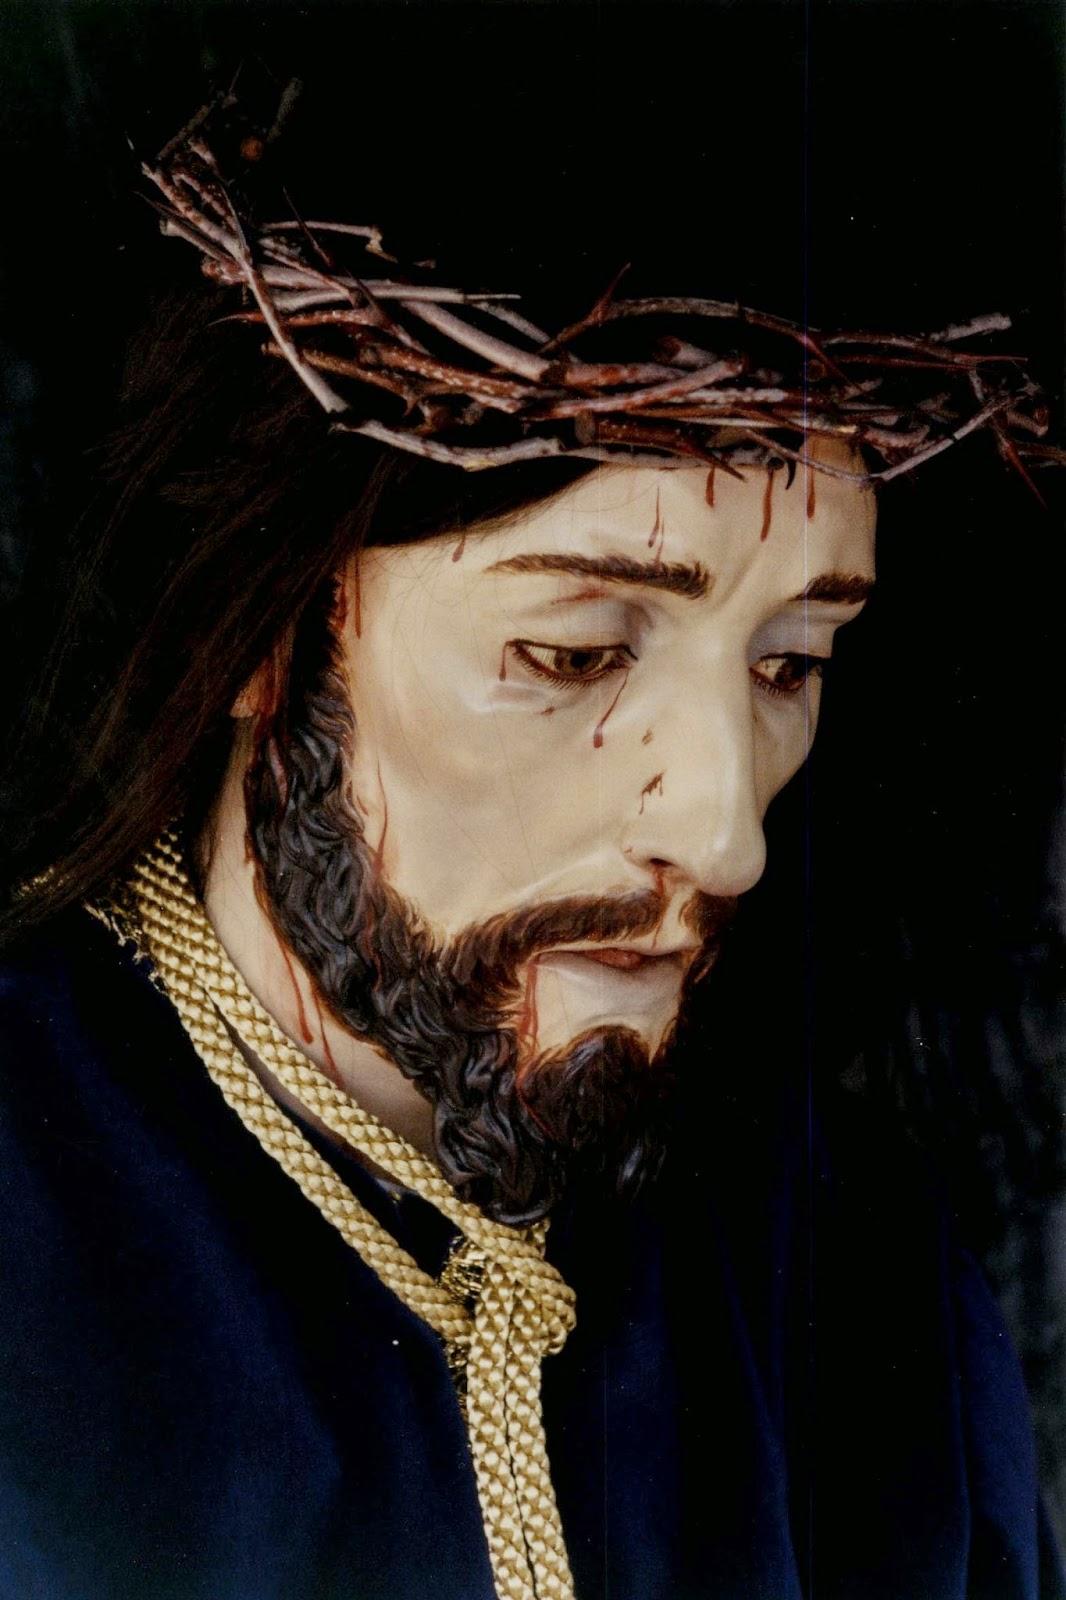 Cristo Misericordia La Algaida Arturo Serra Murcia escultura 2